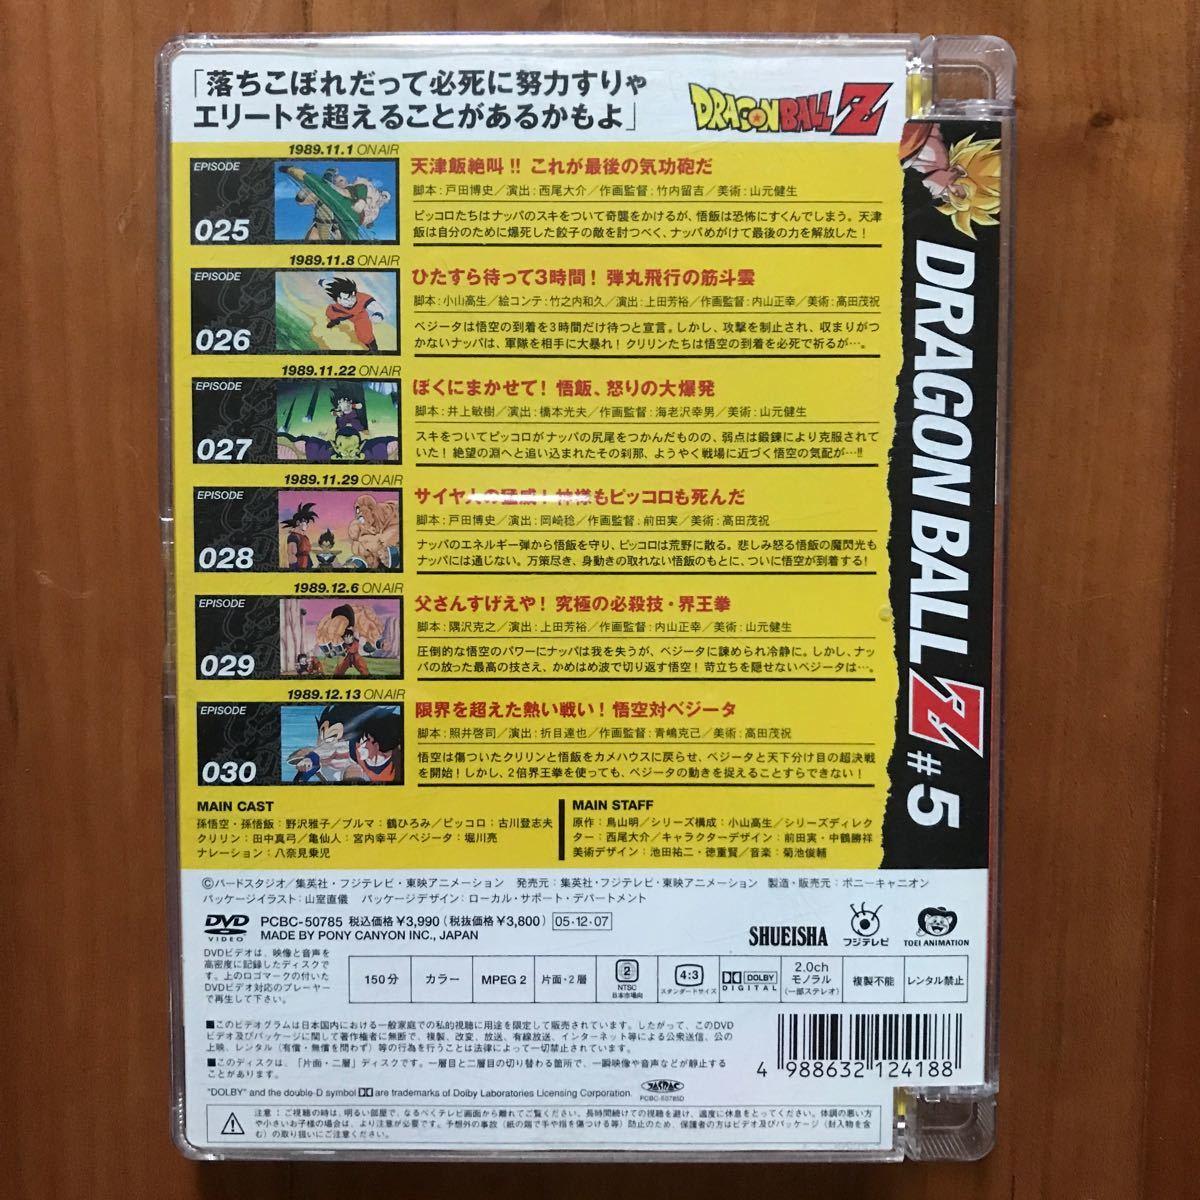 【DVD】DRAGON BALL Z #4, #5 ドラゴンボールZ 野沢雅子